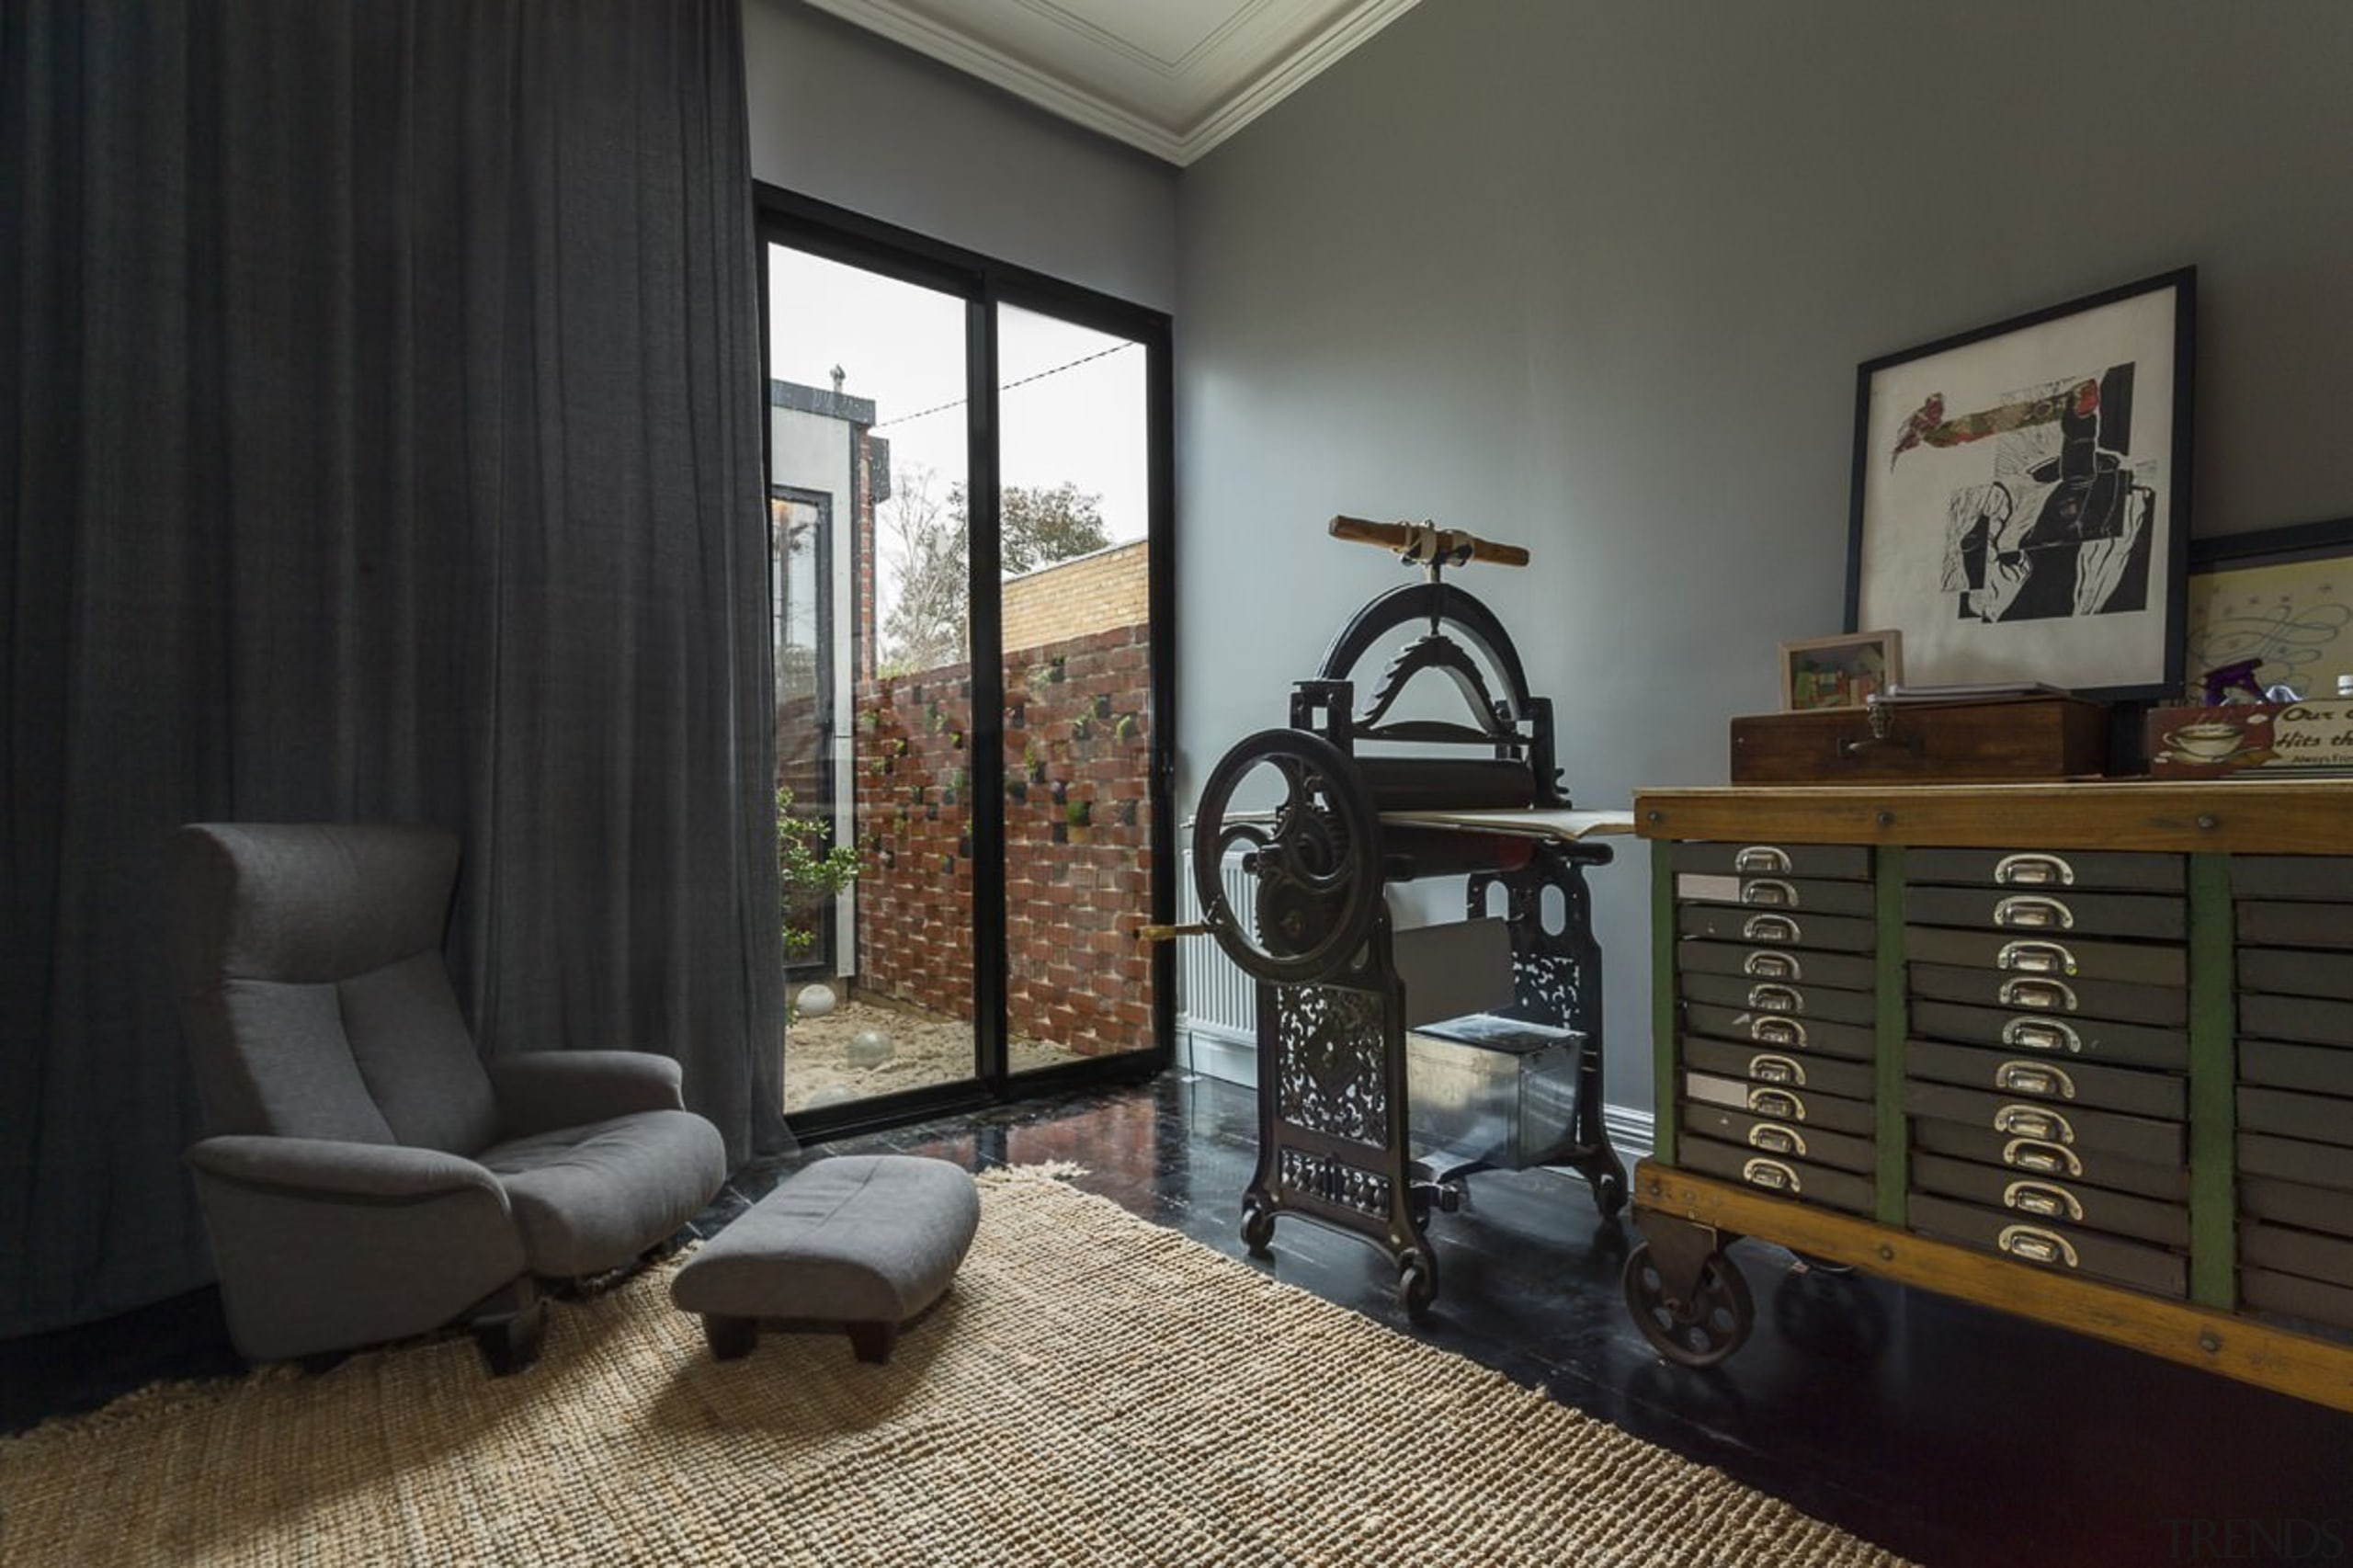 High ceilings make for a spacious study area home, interior design, living room, real estate, room, window, black